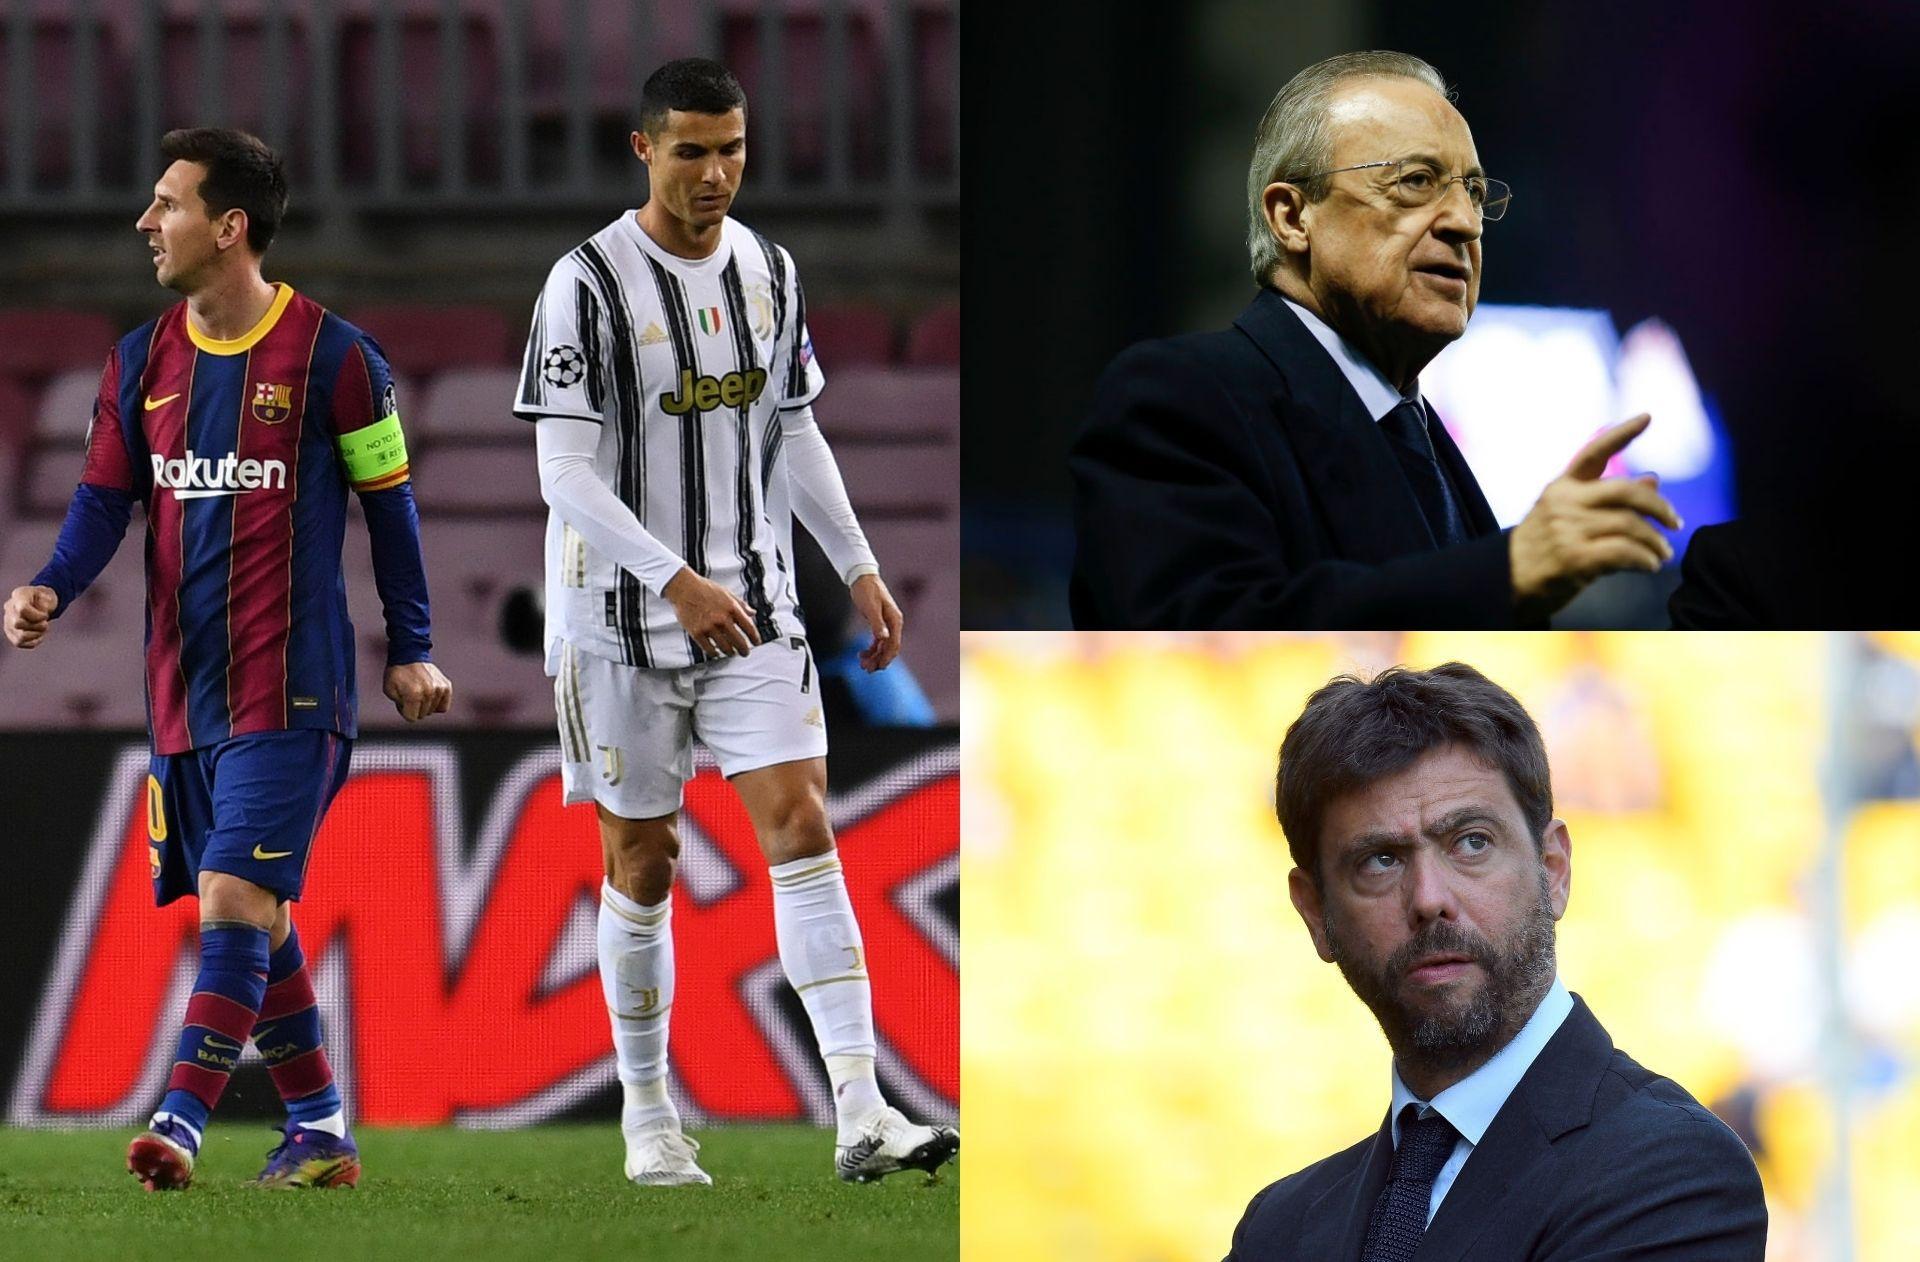 European Super League: The 12 clubs & tournament format confirmed